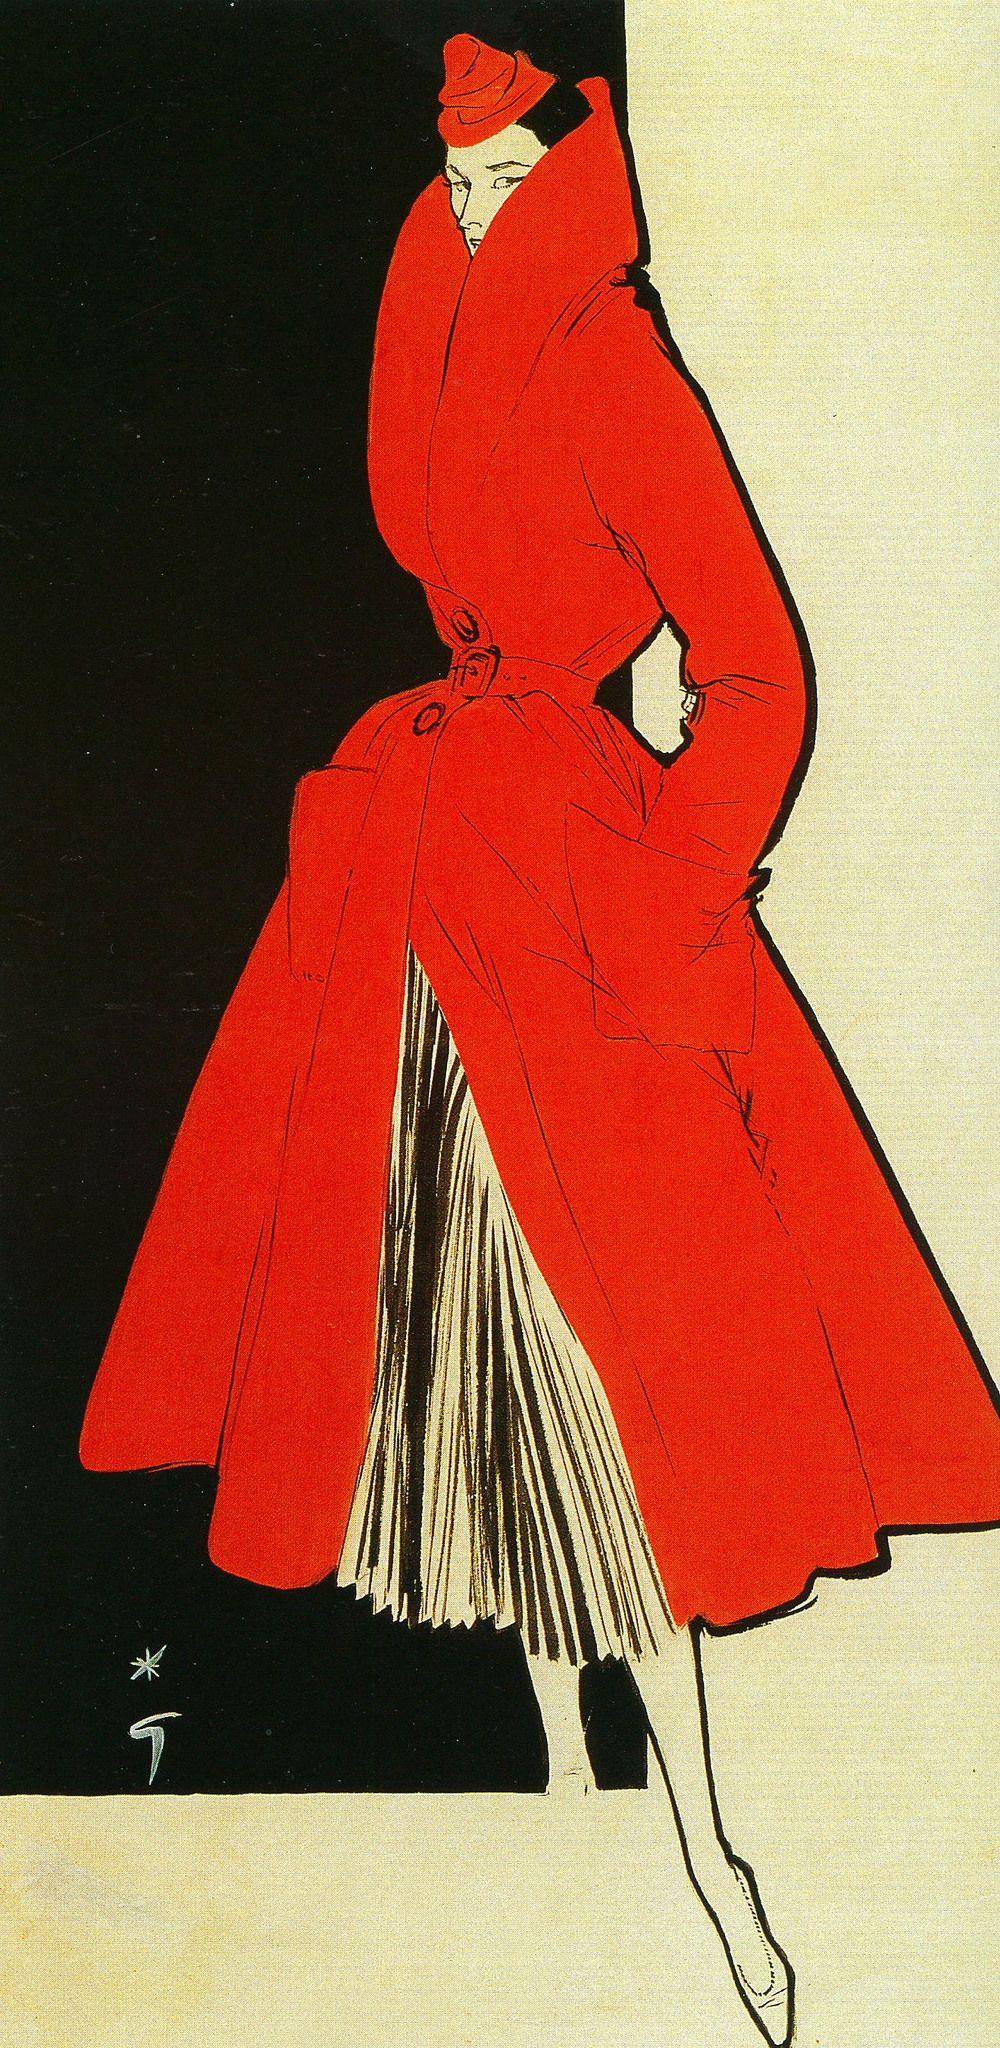 Illustrated by Rene Gruau, 1956